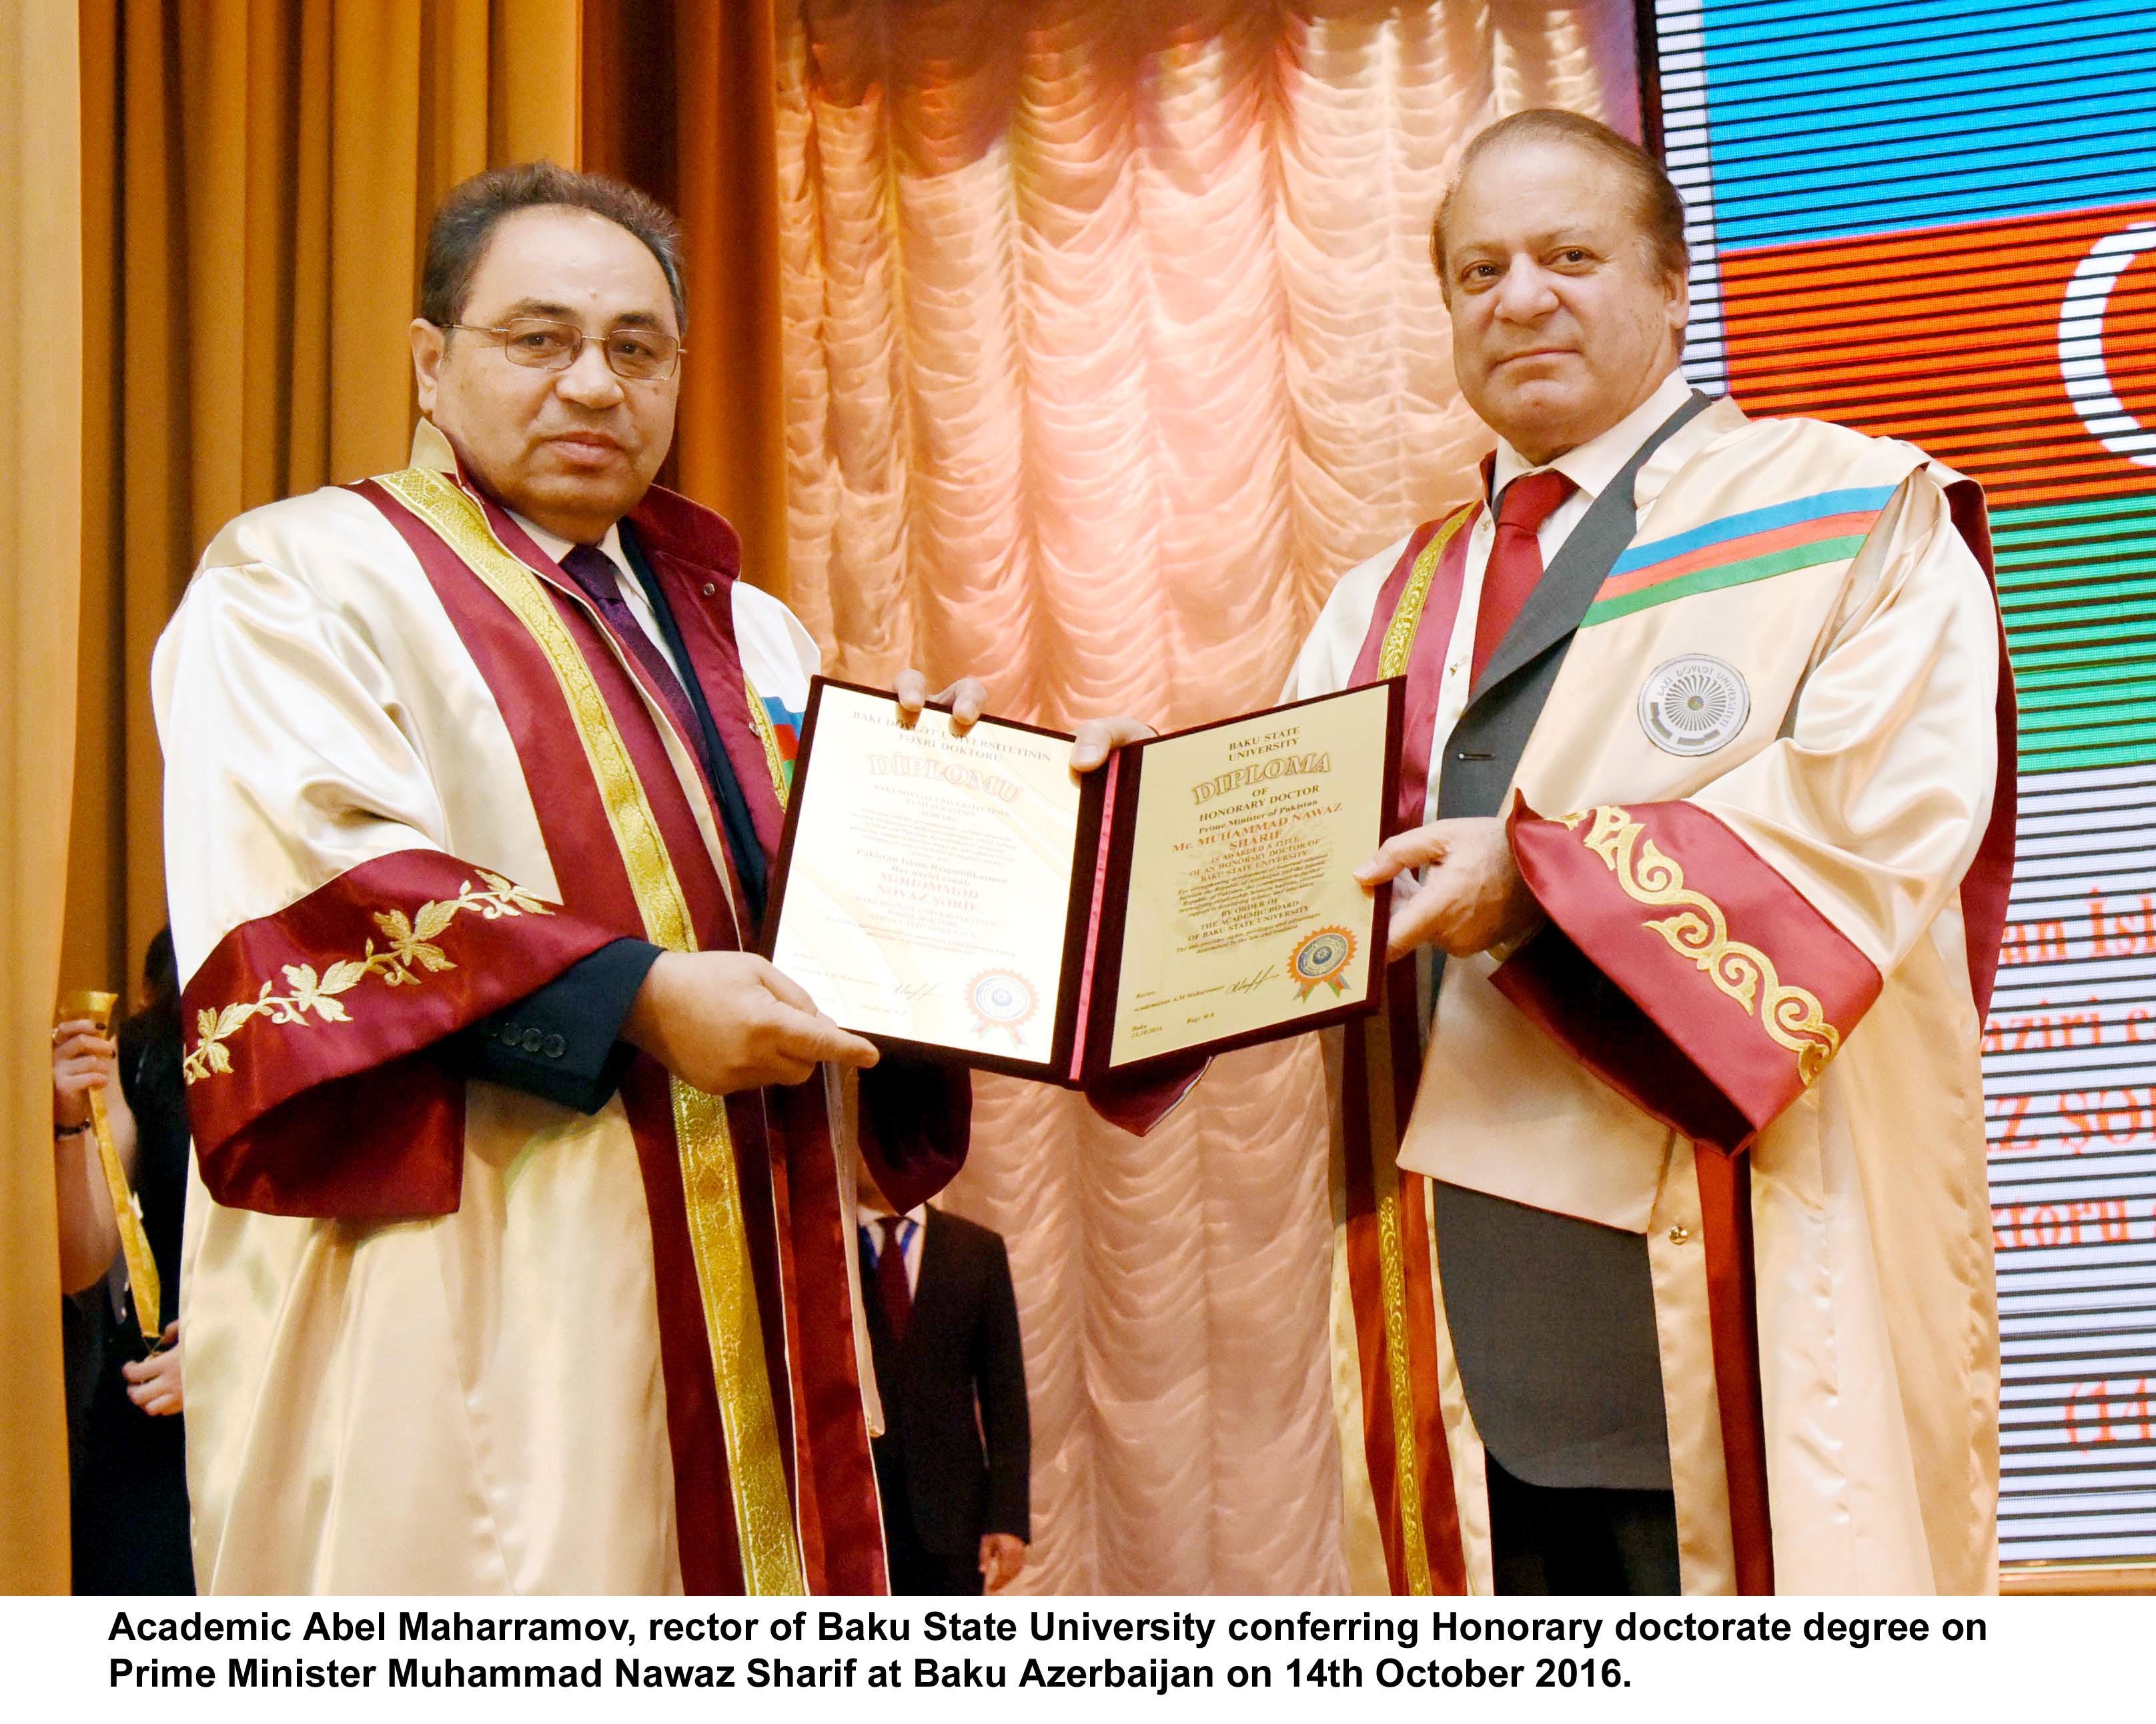 Academic Abel Maharramov, rector of Baku State University conferring Honorary doctorate degree on Prime Minister Muhammad Nawaz Sharif at Baku Azerbaijan on 14th October 2016.